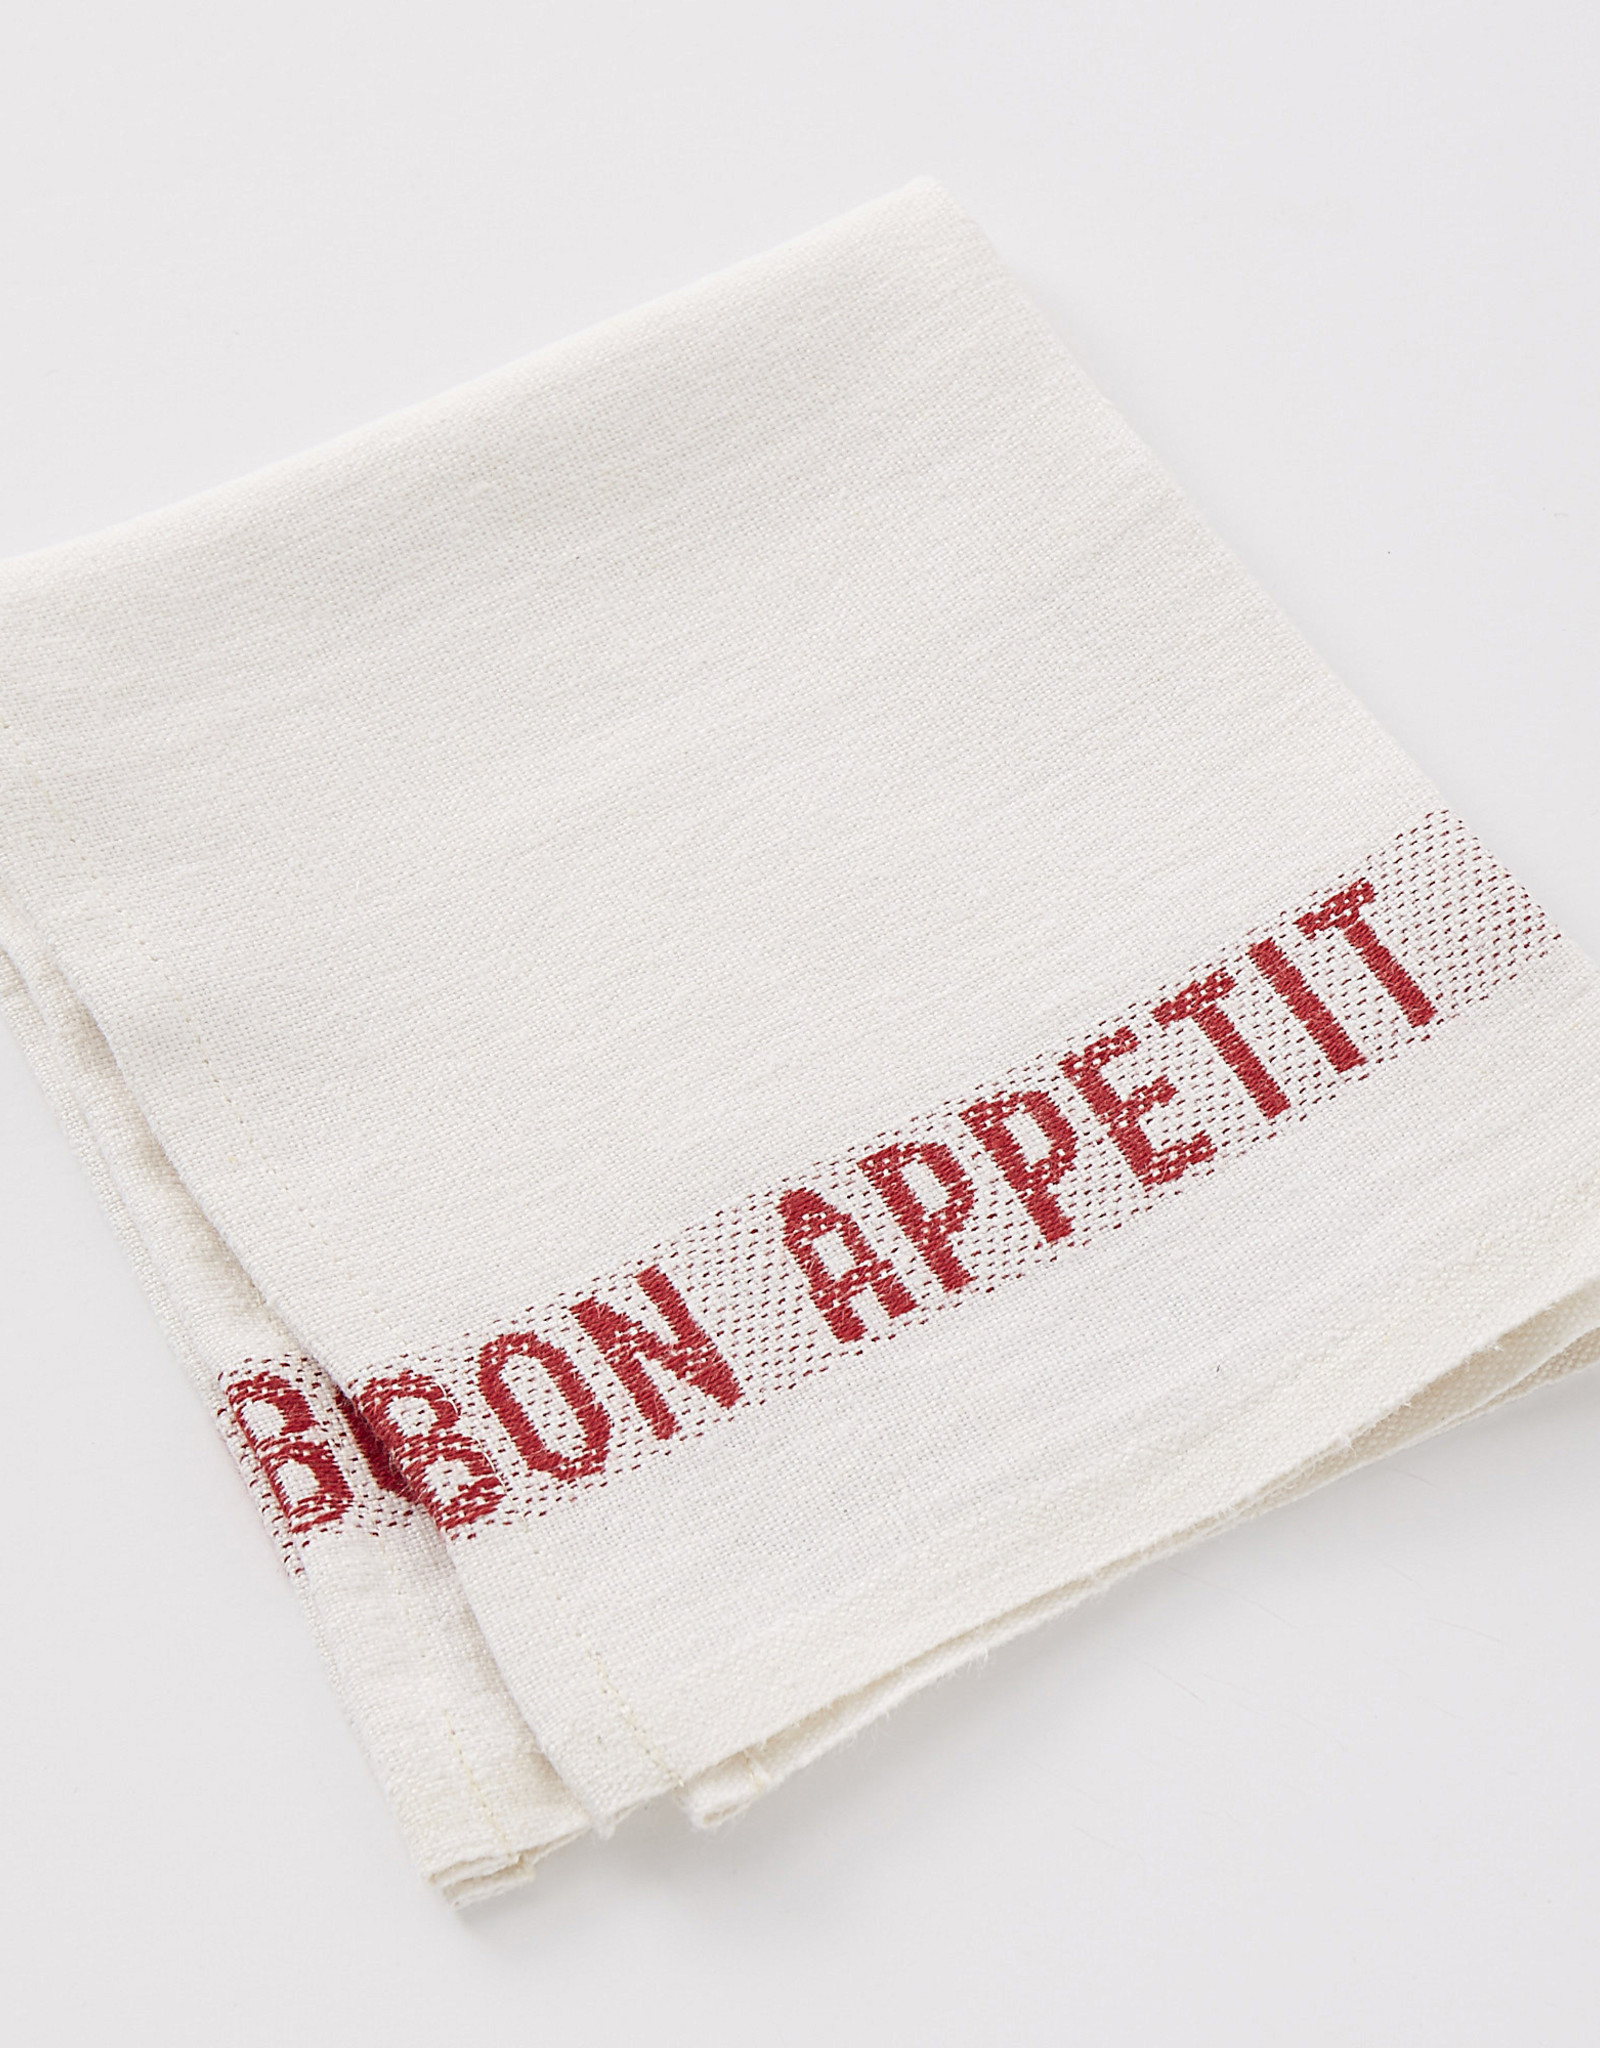 "Charvet Editions - Napkin Placemat Bon Appetit White/Red- 17""x13"""